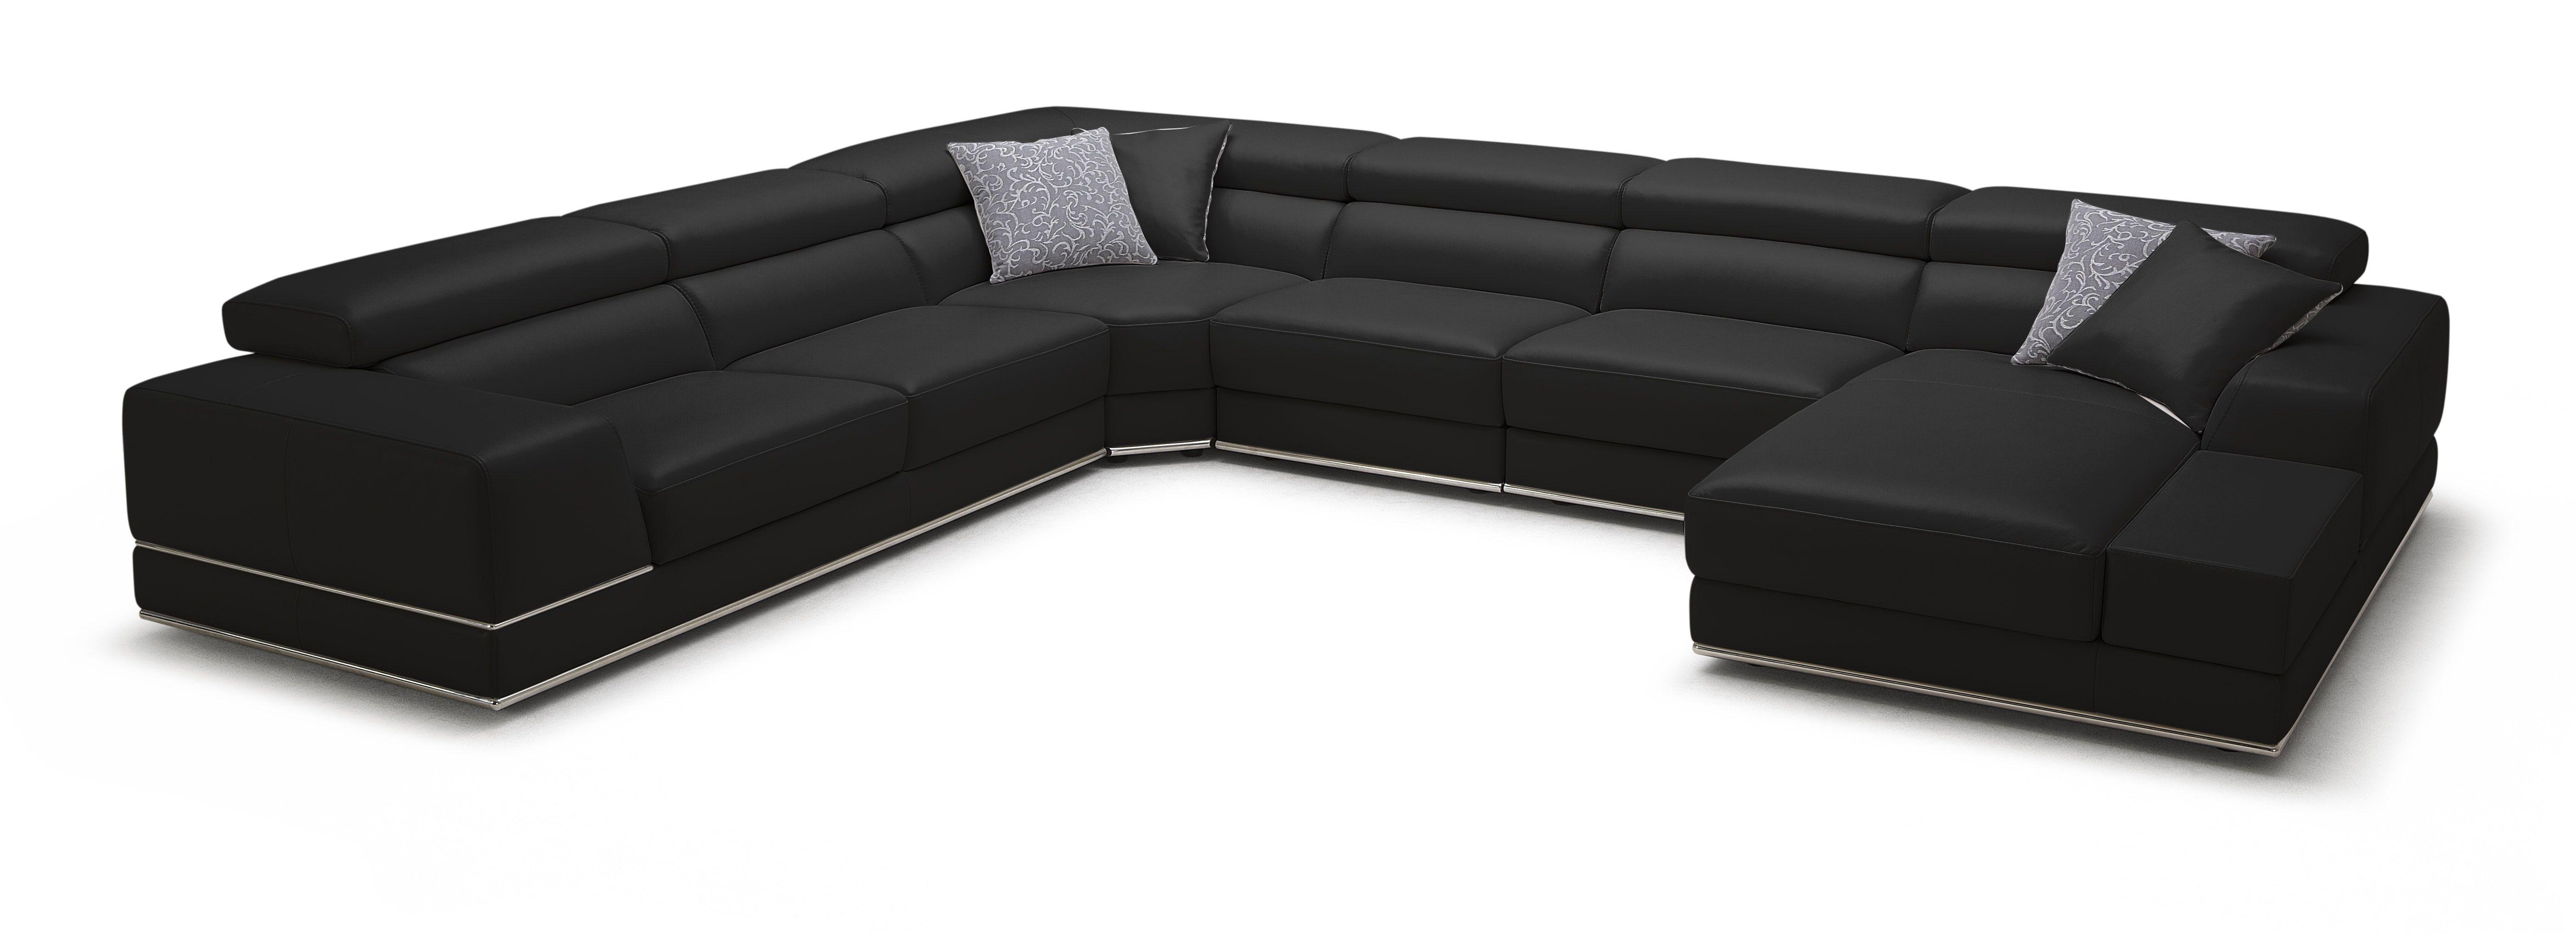 Miraculous Bergamo Extended Sectional Leather Modern Sofa Black Evergreenethics Interior Chair Design Evergreenethicsorg